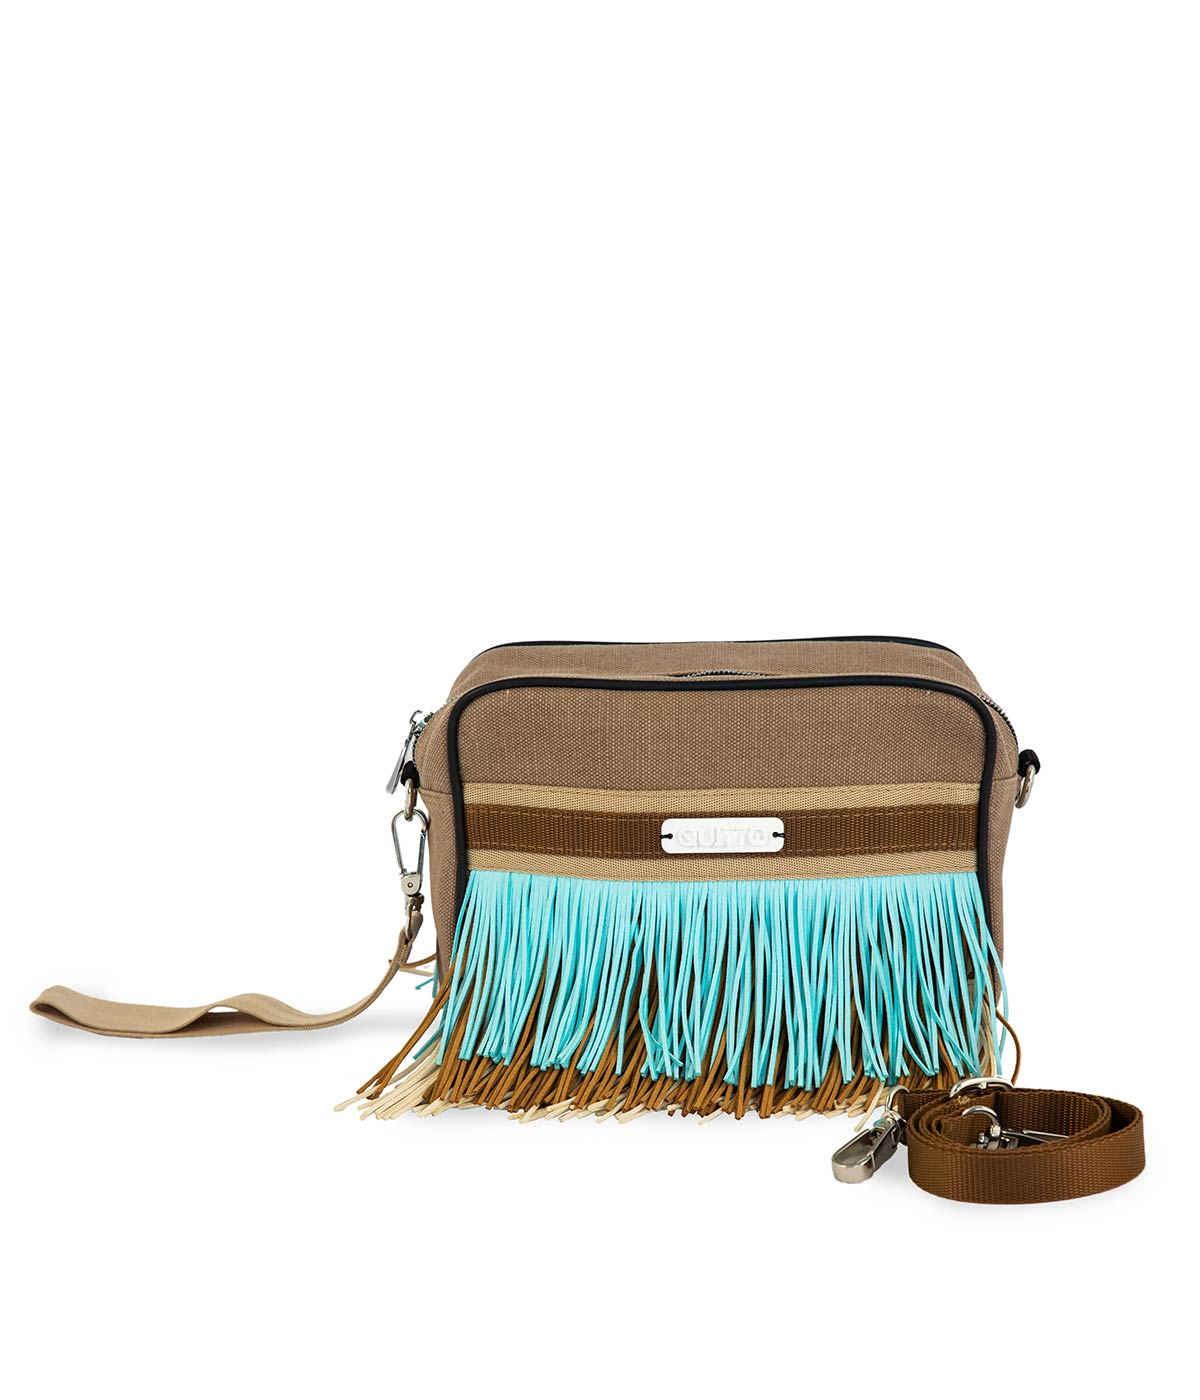 Beauty Bag Tessuto Tecnico Marrone Frange Alcantara Quittobags